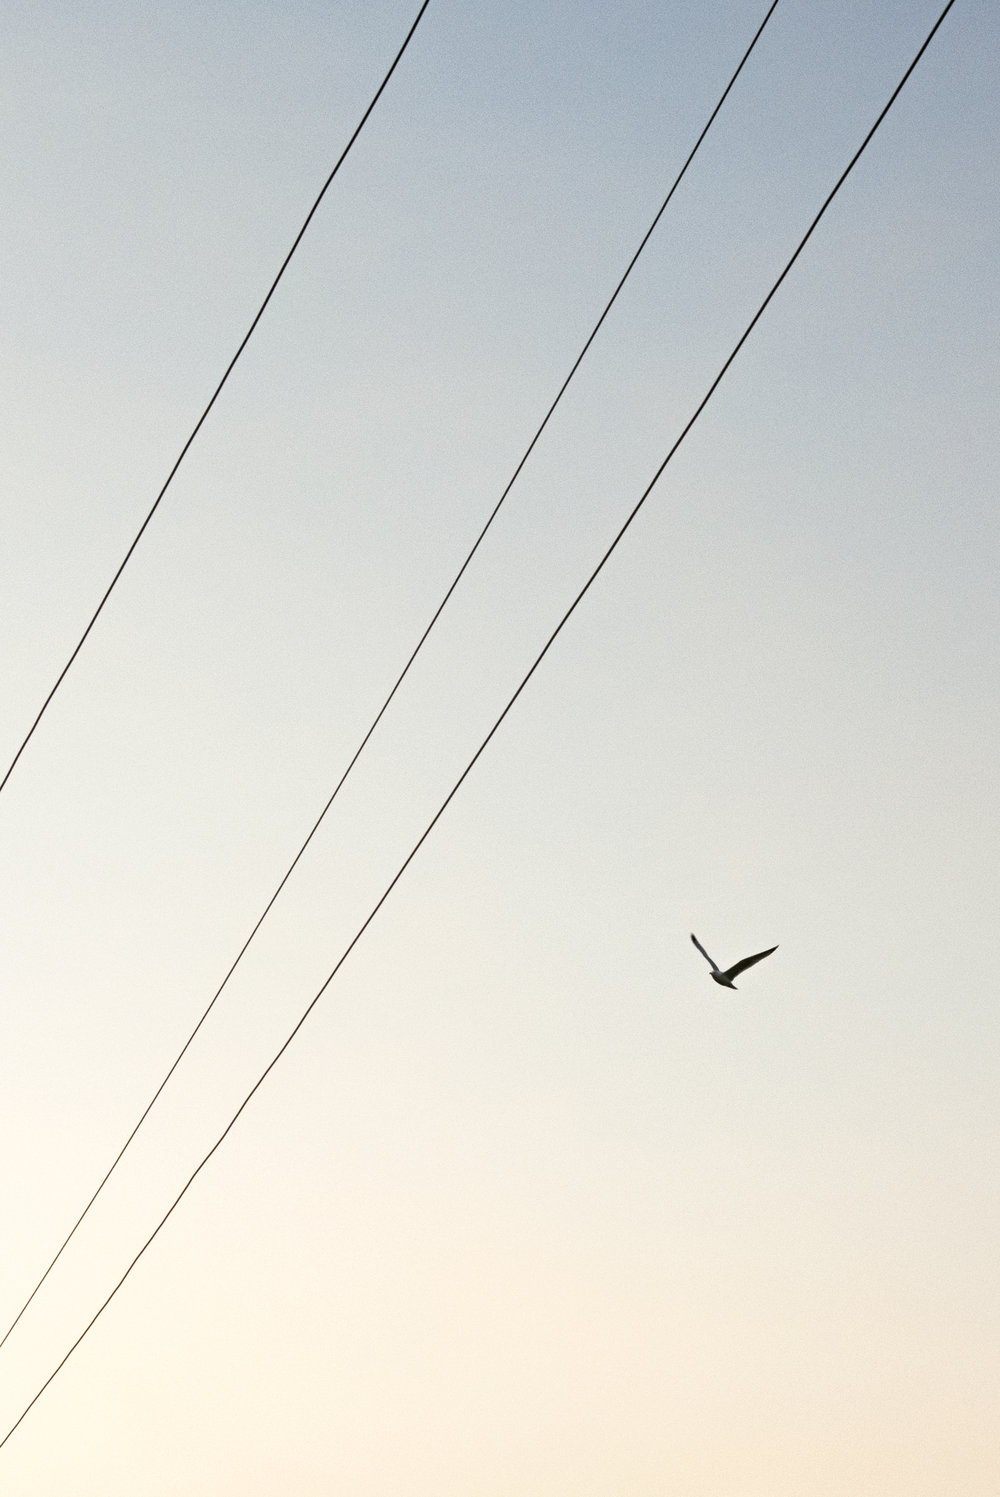 DSC_0590_BIRD.jpg